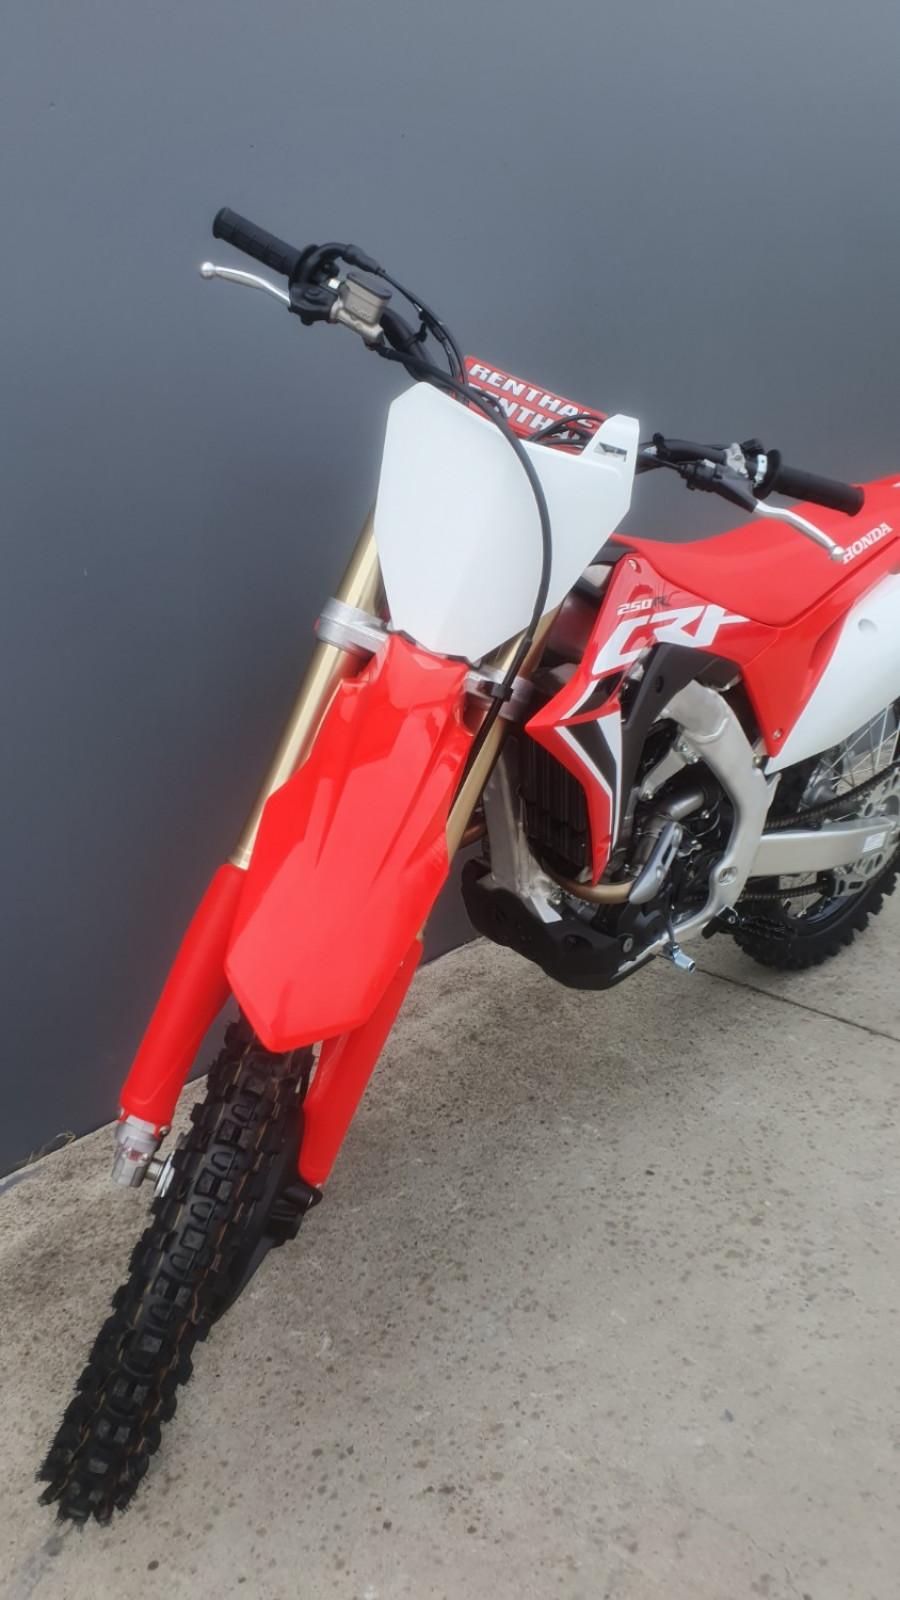 2020 Honda CRF250R TEMP 2020 CRF250R Motorcycle Image 13